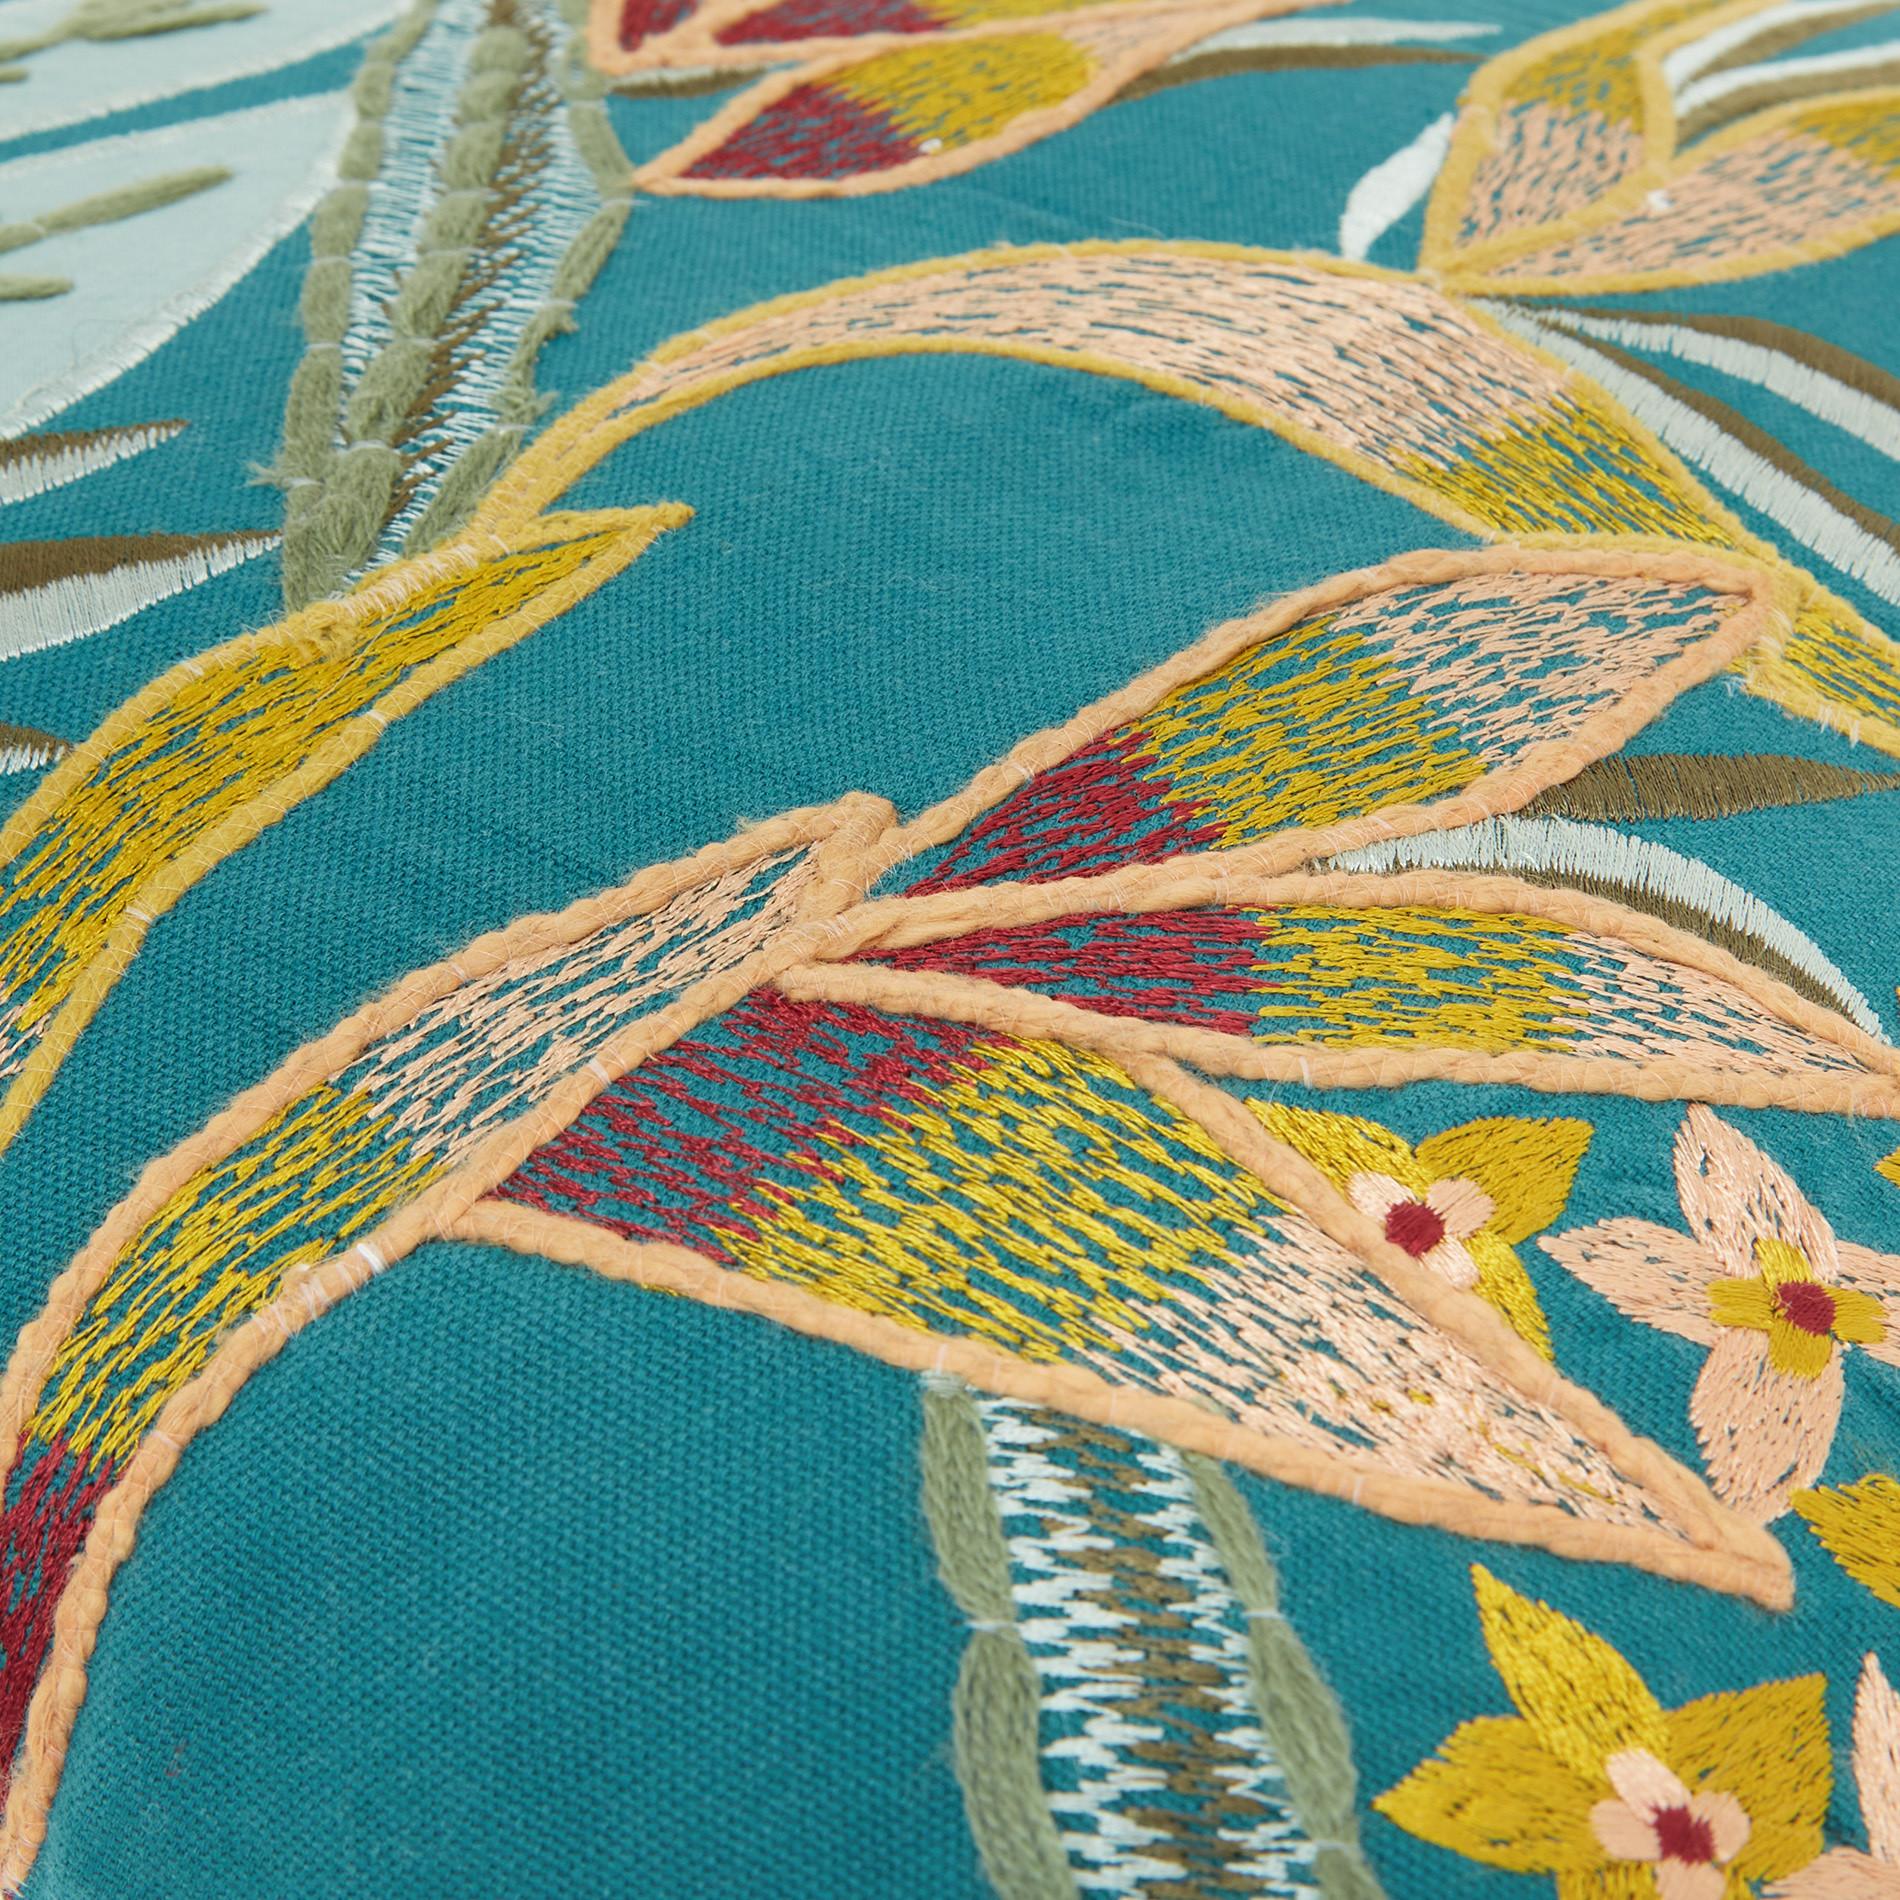 Cuscino ricamo foglie 45x45cm, Verde smeraldo, large image number 3